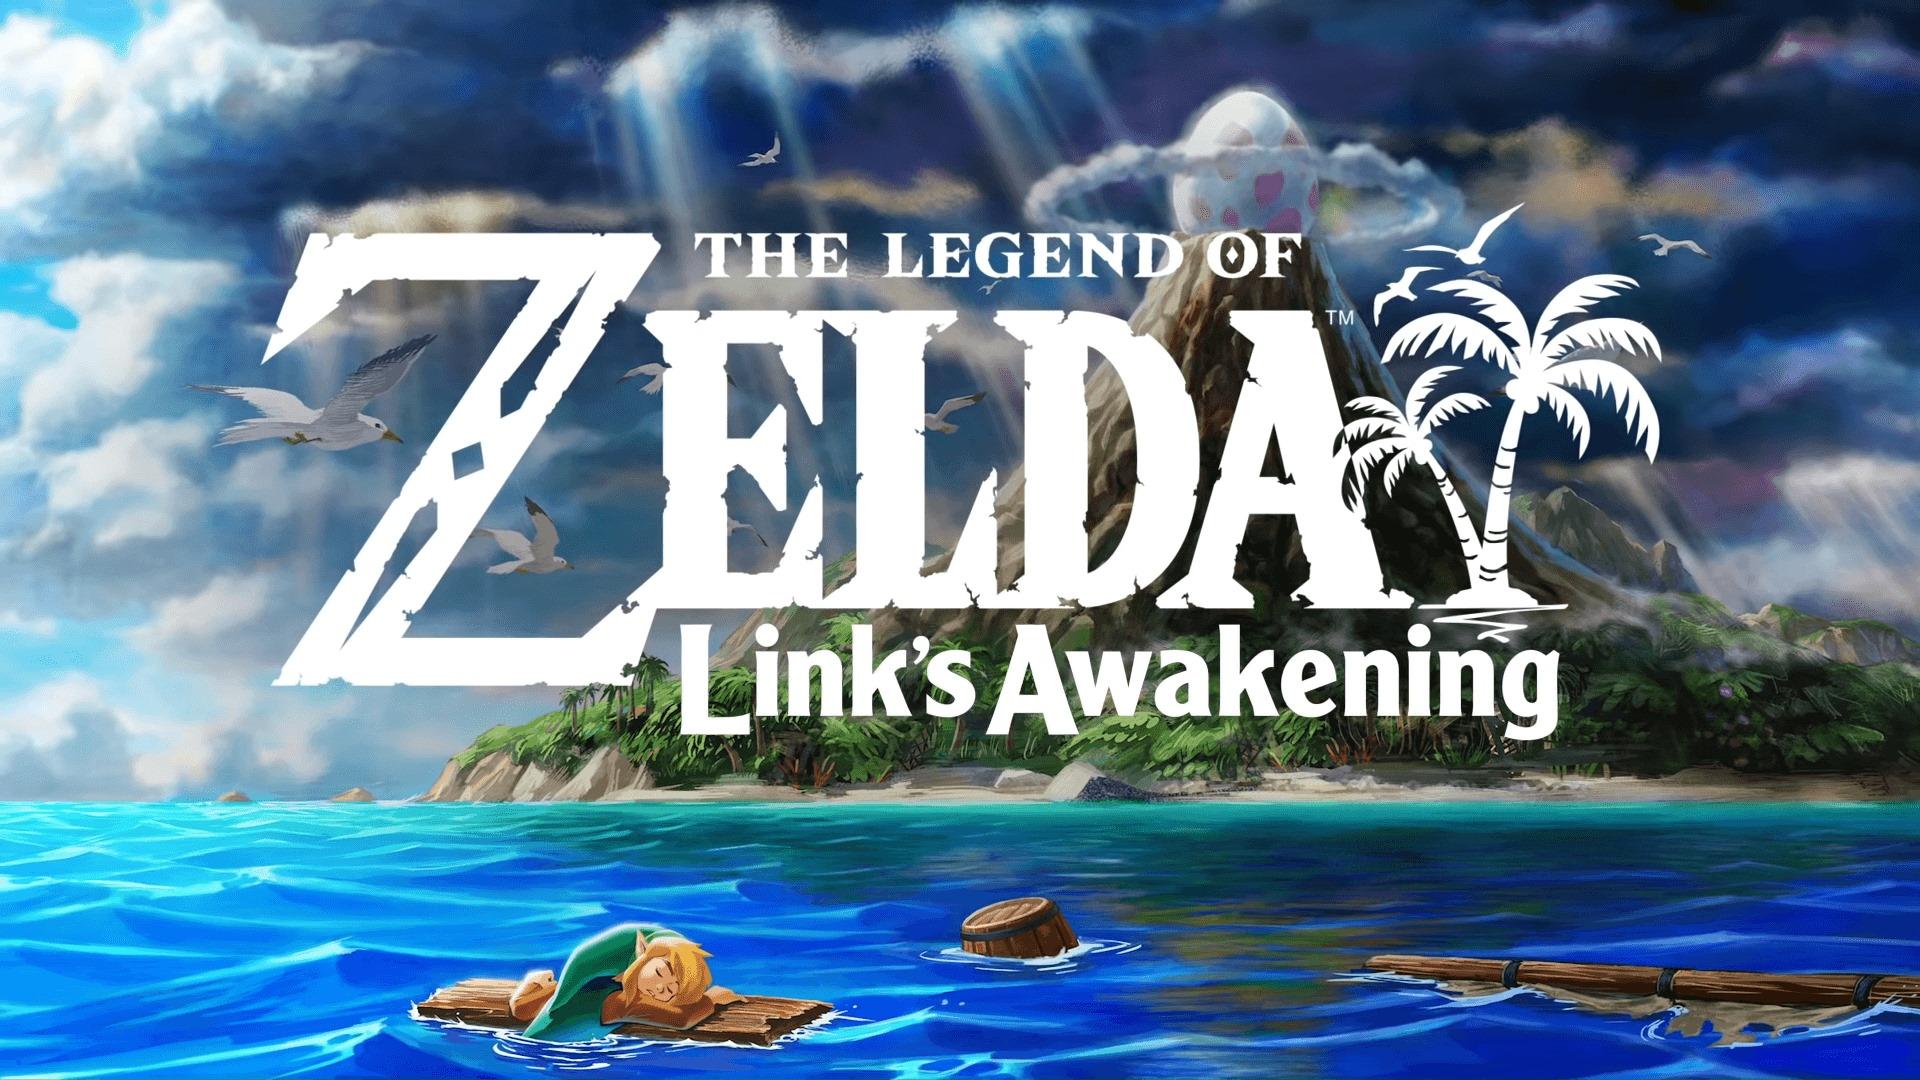 The Legend of Zelda: Link's Awakening Reveals New Story Trailer-Released by Ninetendo switch